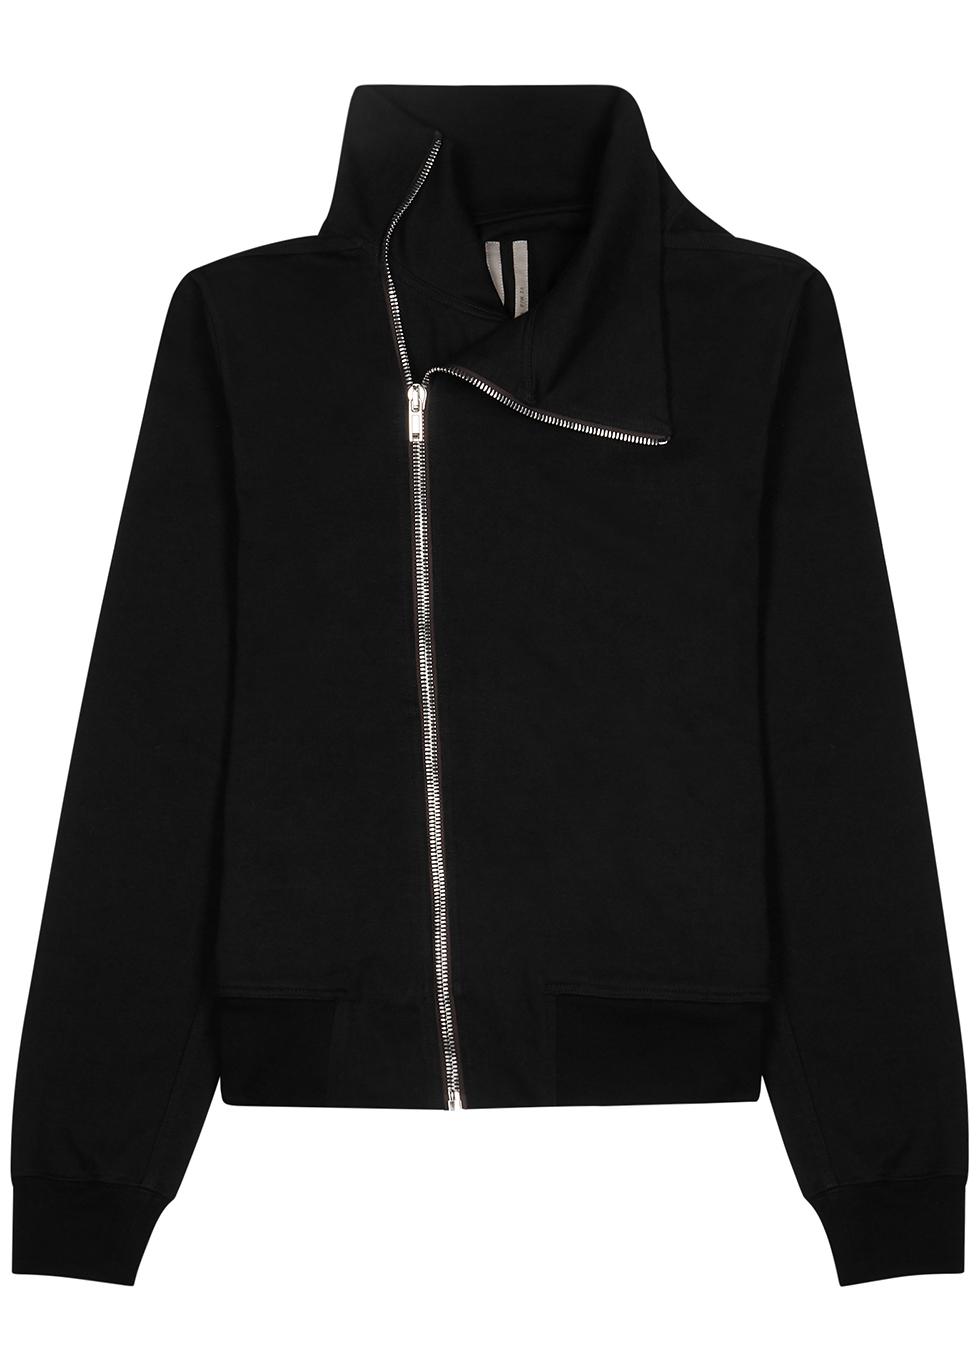 Black cotton track jacket